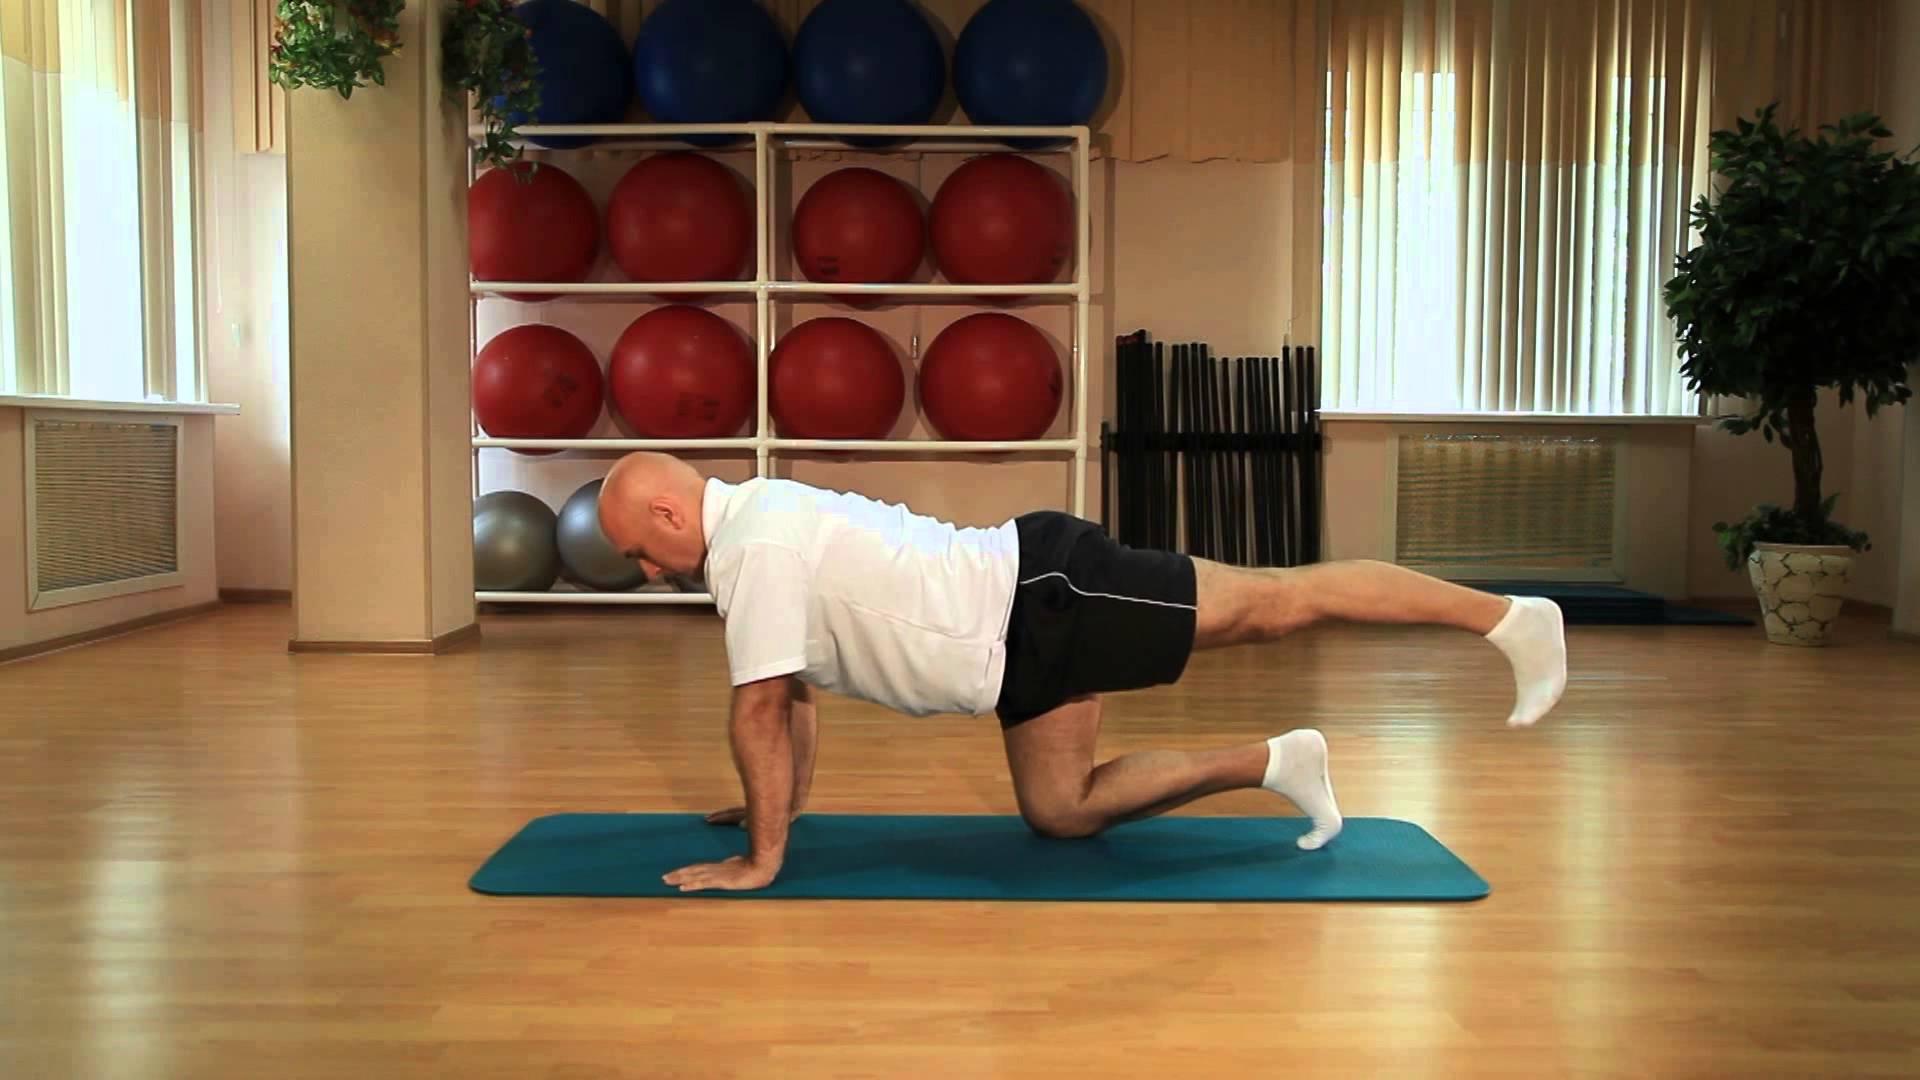 Упражнения для тазобедренного сустава Сергея Михайловича 49